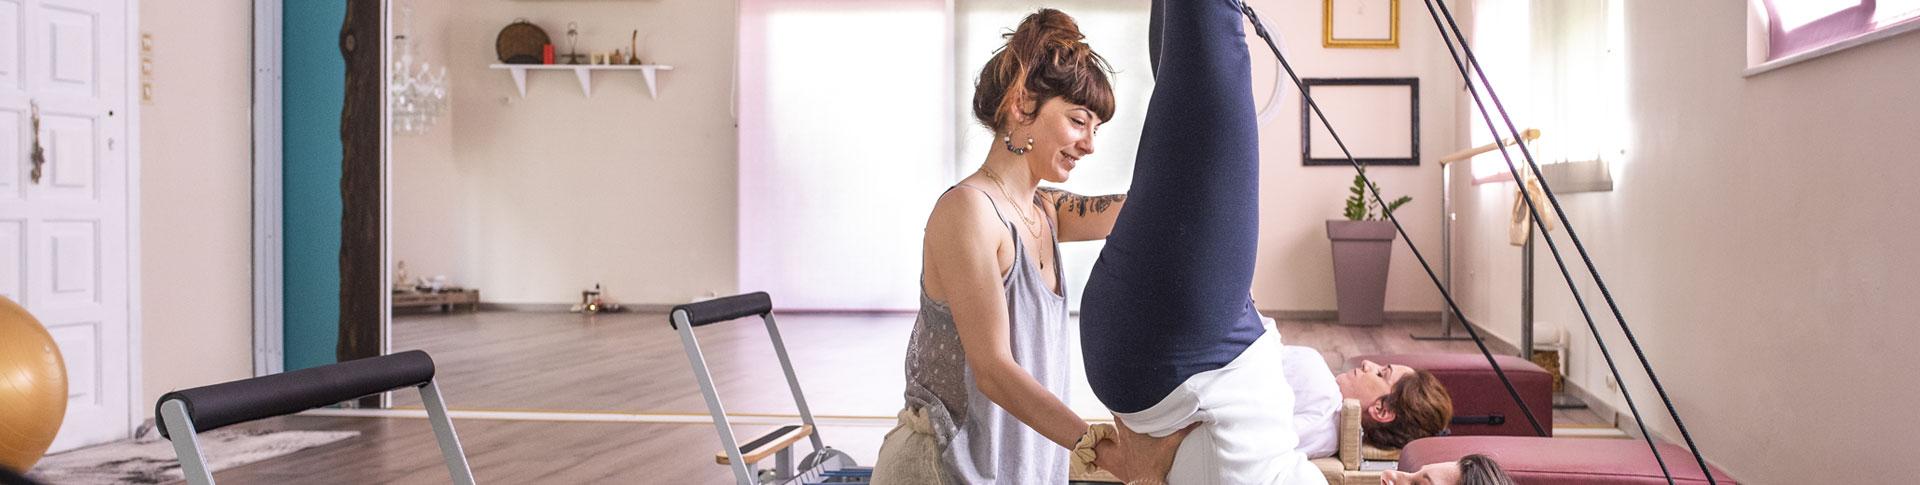 Align by Alin Yoga